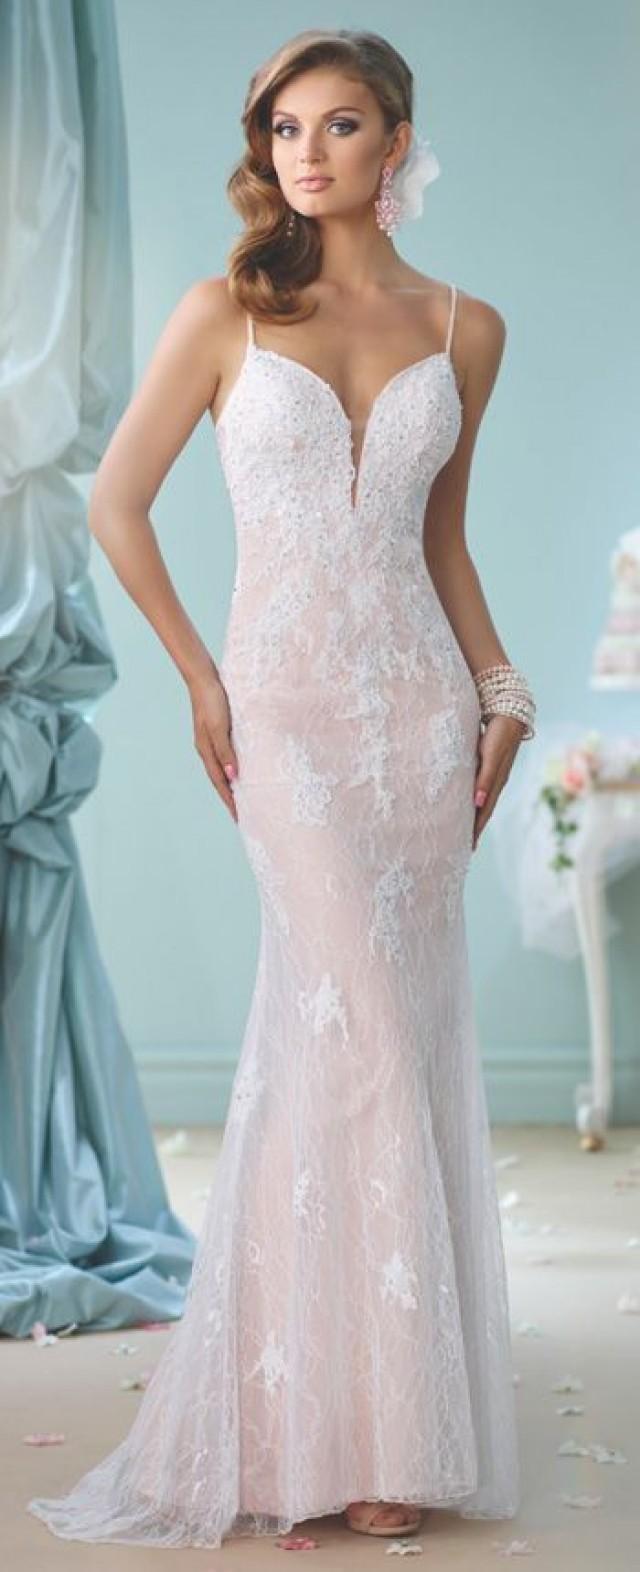 Amazing Portia De Rossi Wedding Dress Pictures Inspiration - Wedding ...